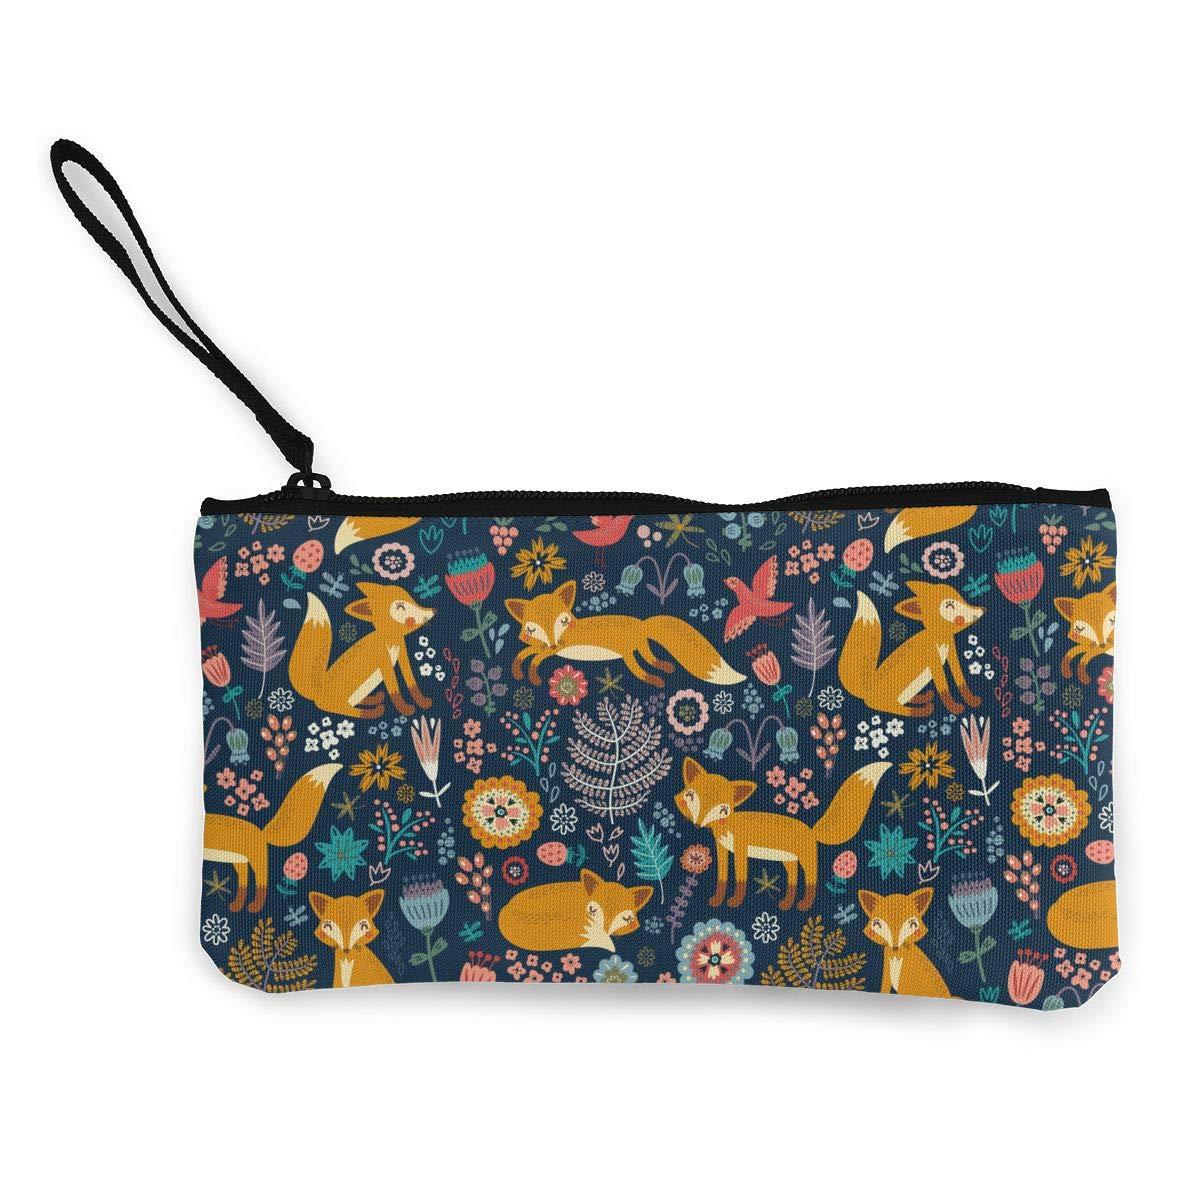 02bb78cb7942 Canvas Coin Purse Fox Floral Pattern Change Cash Bag Zipper Small ...